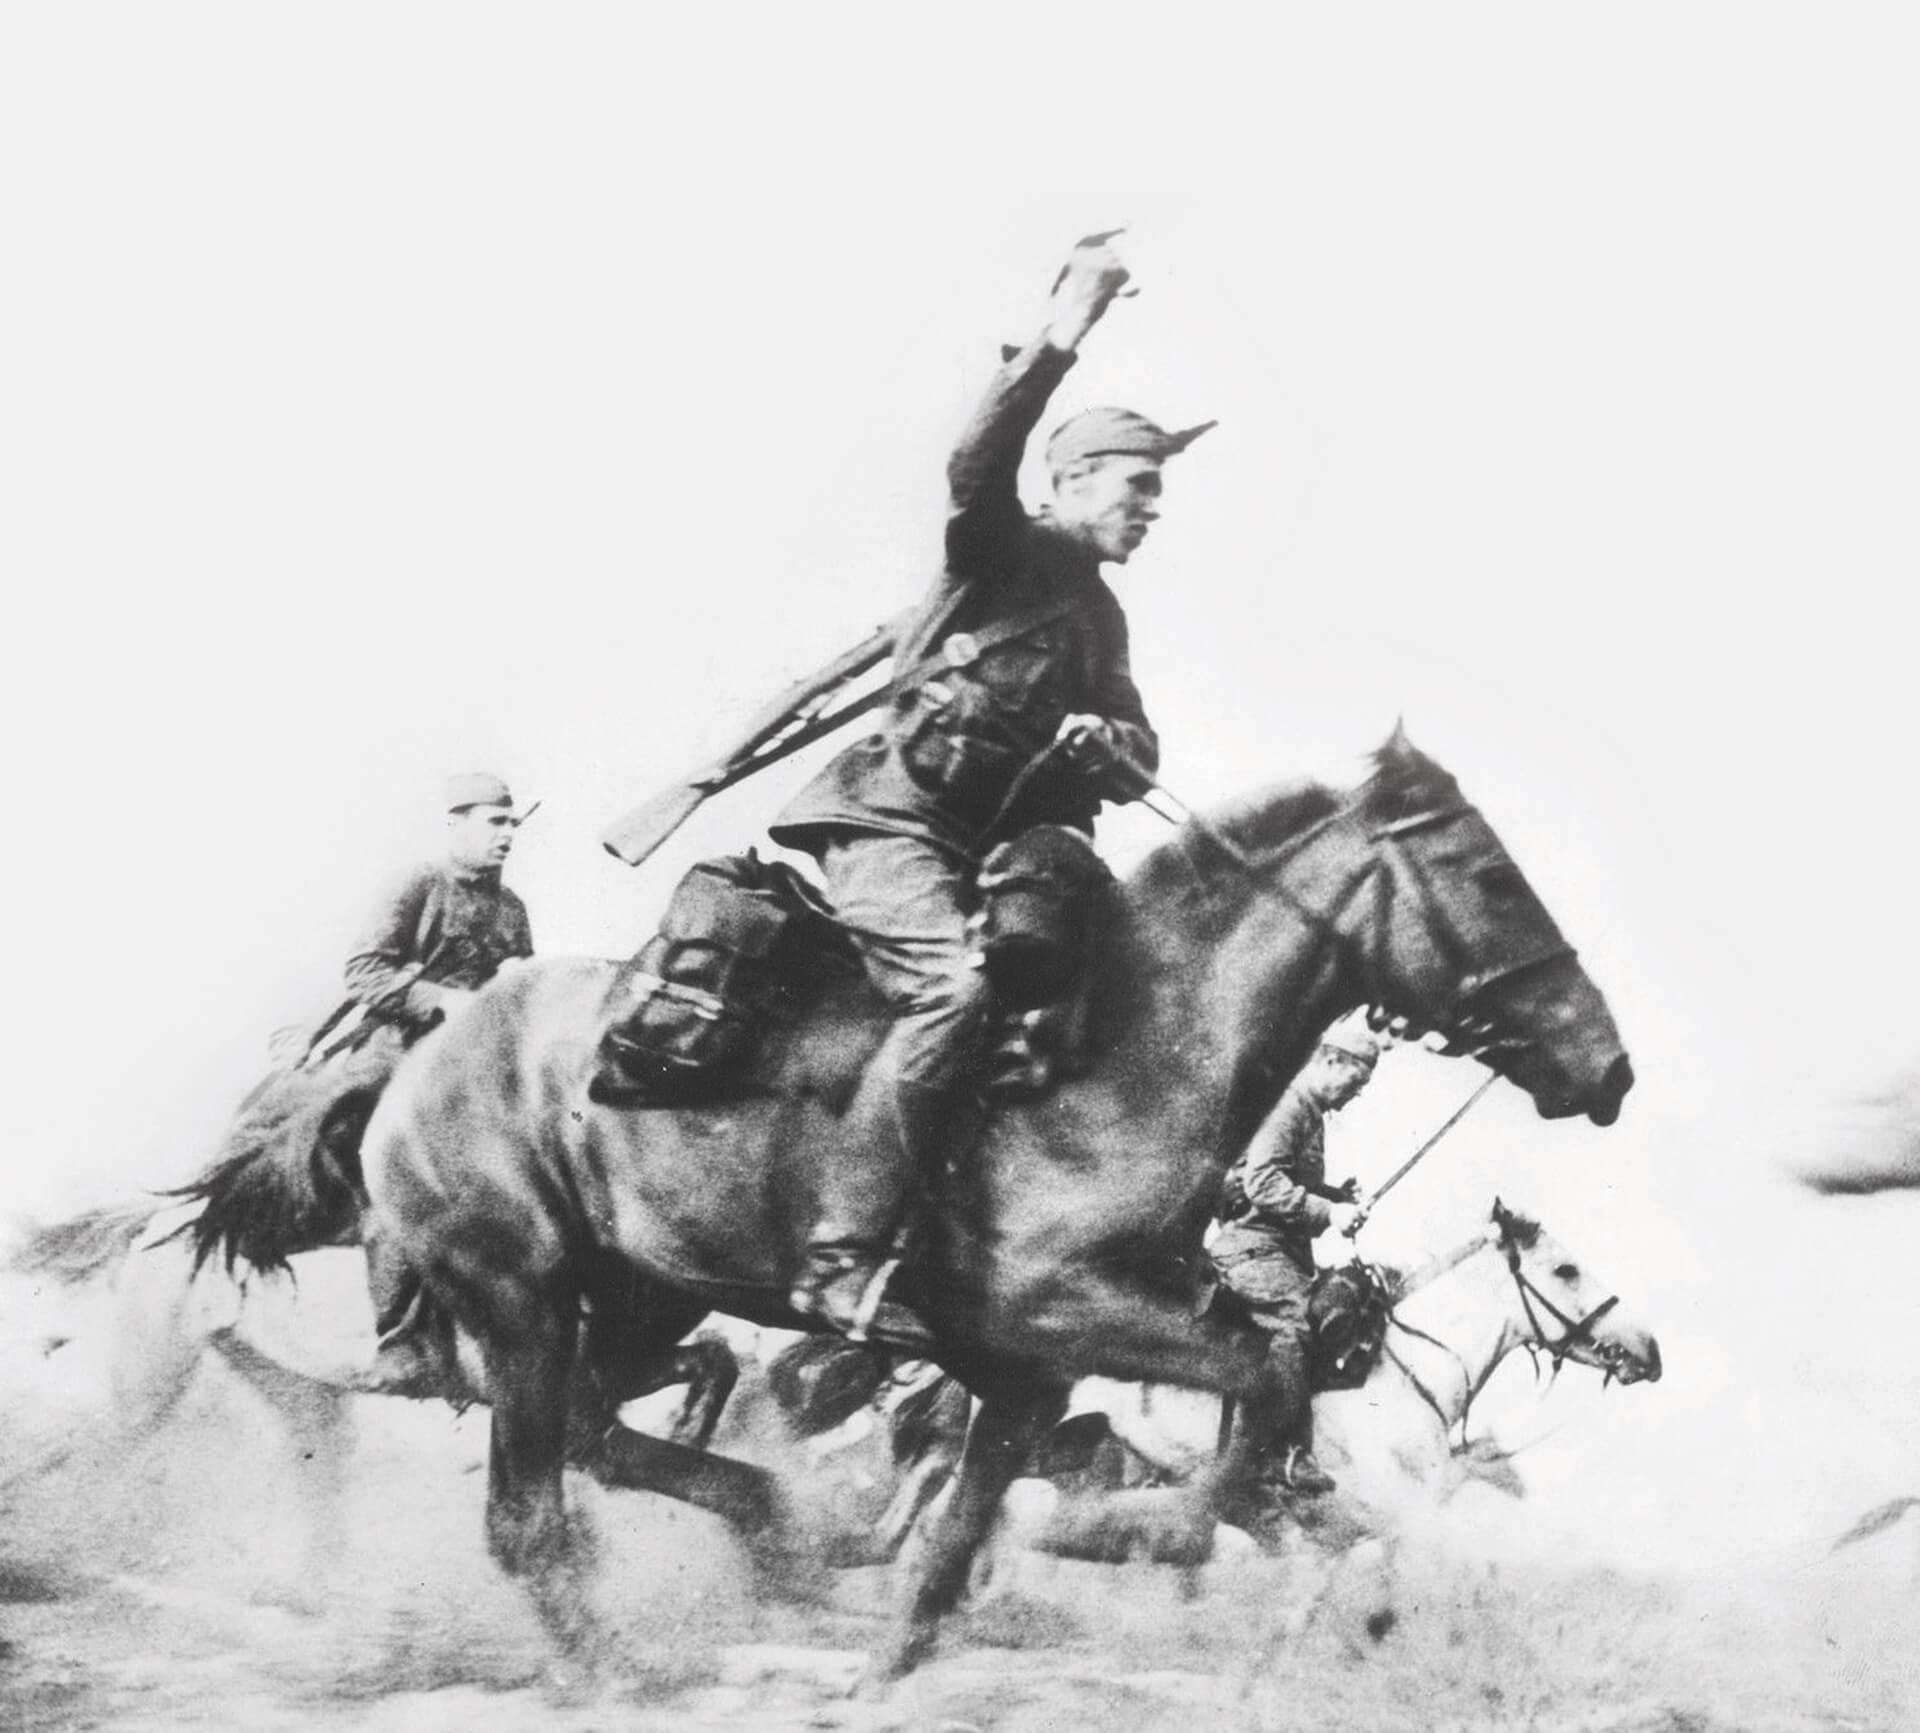 caballería Ejército Rojo